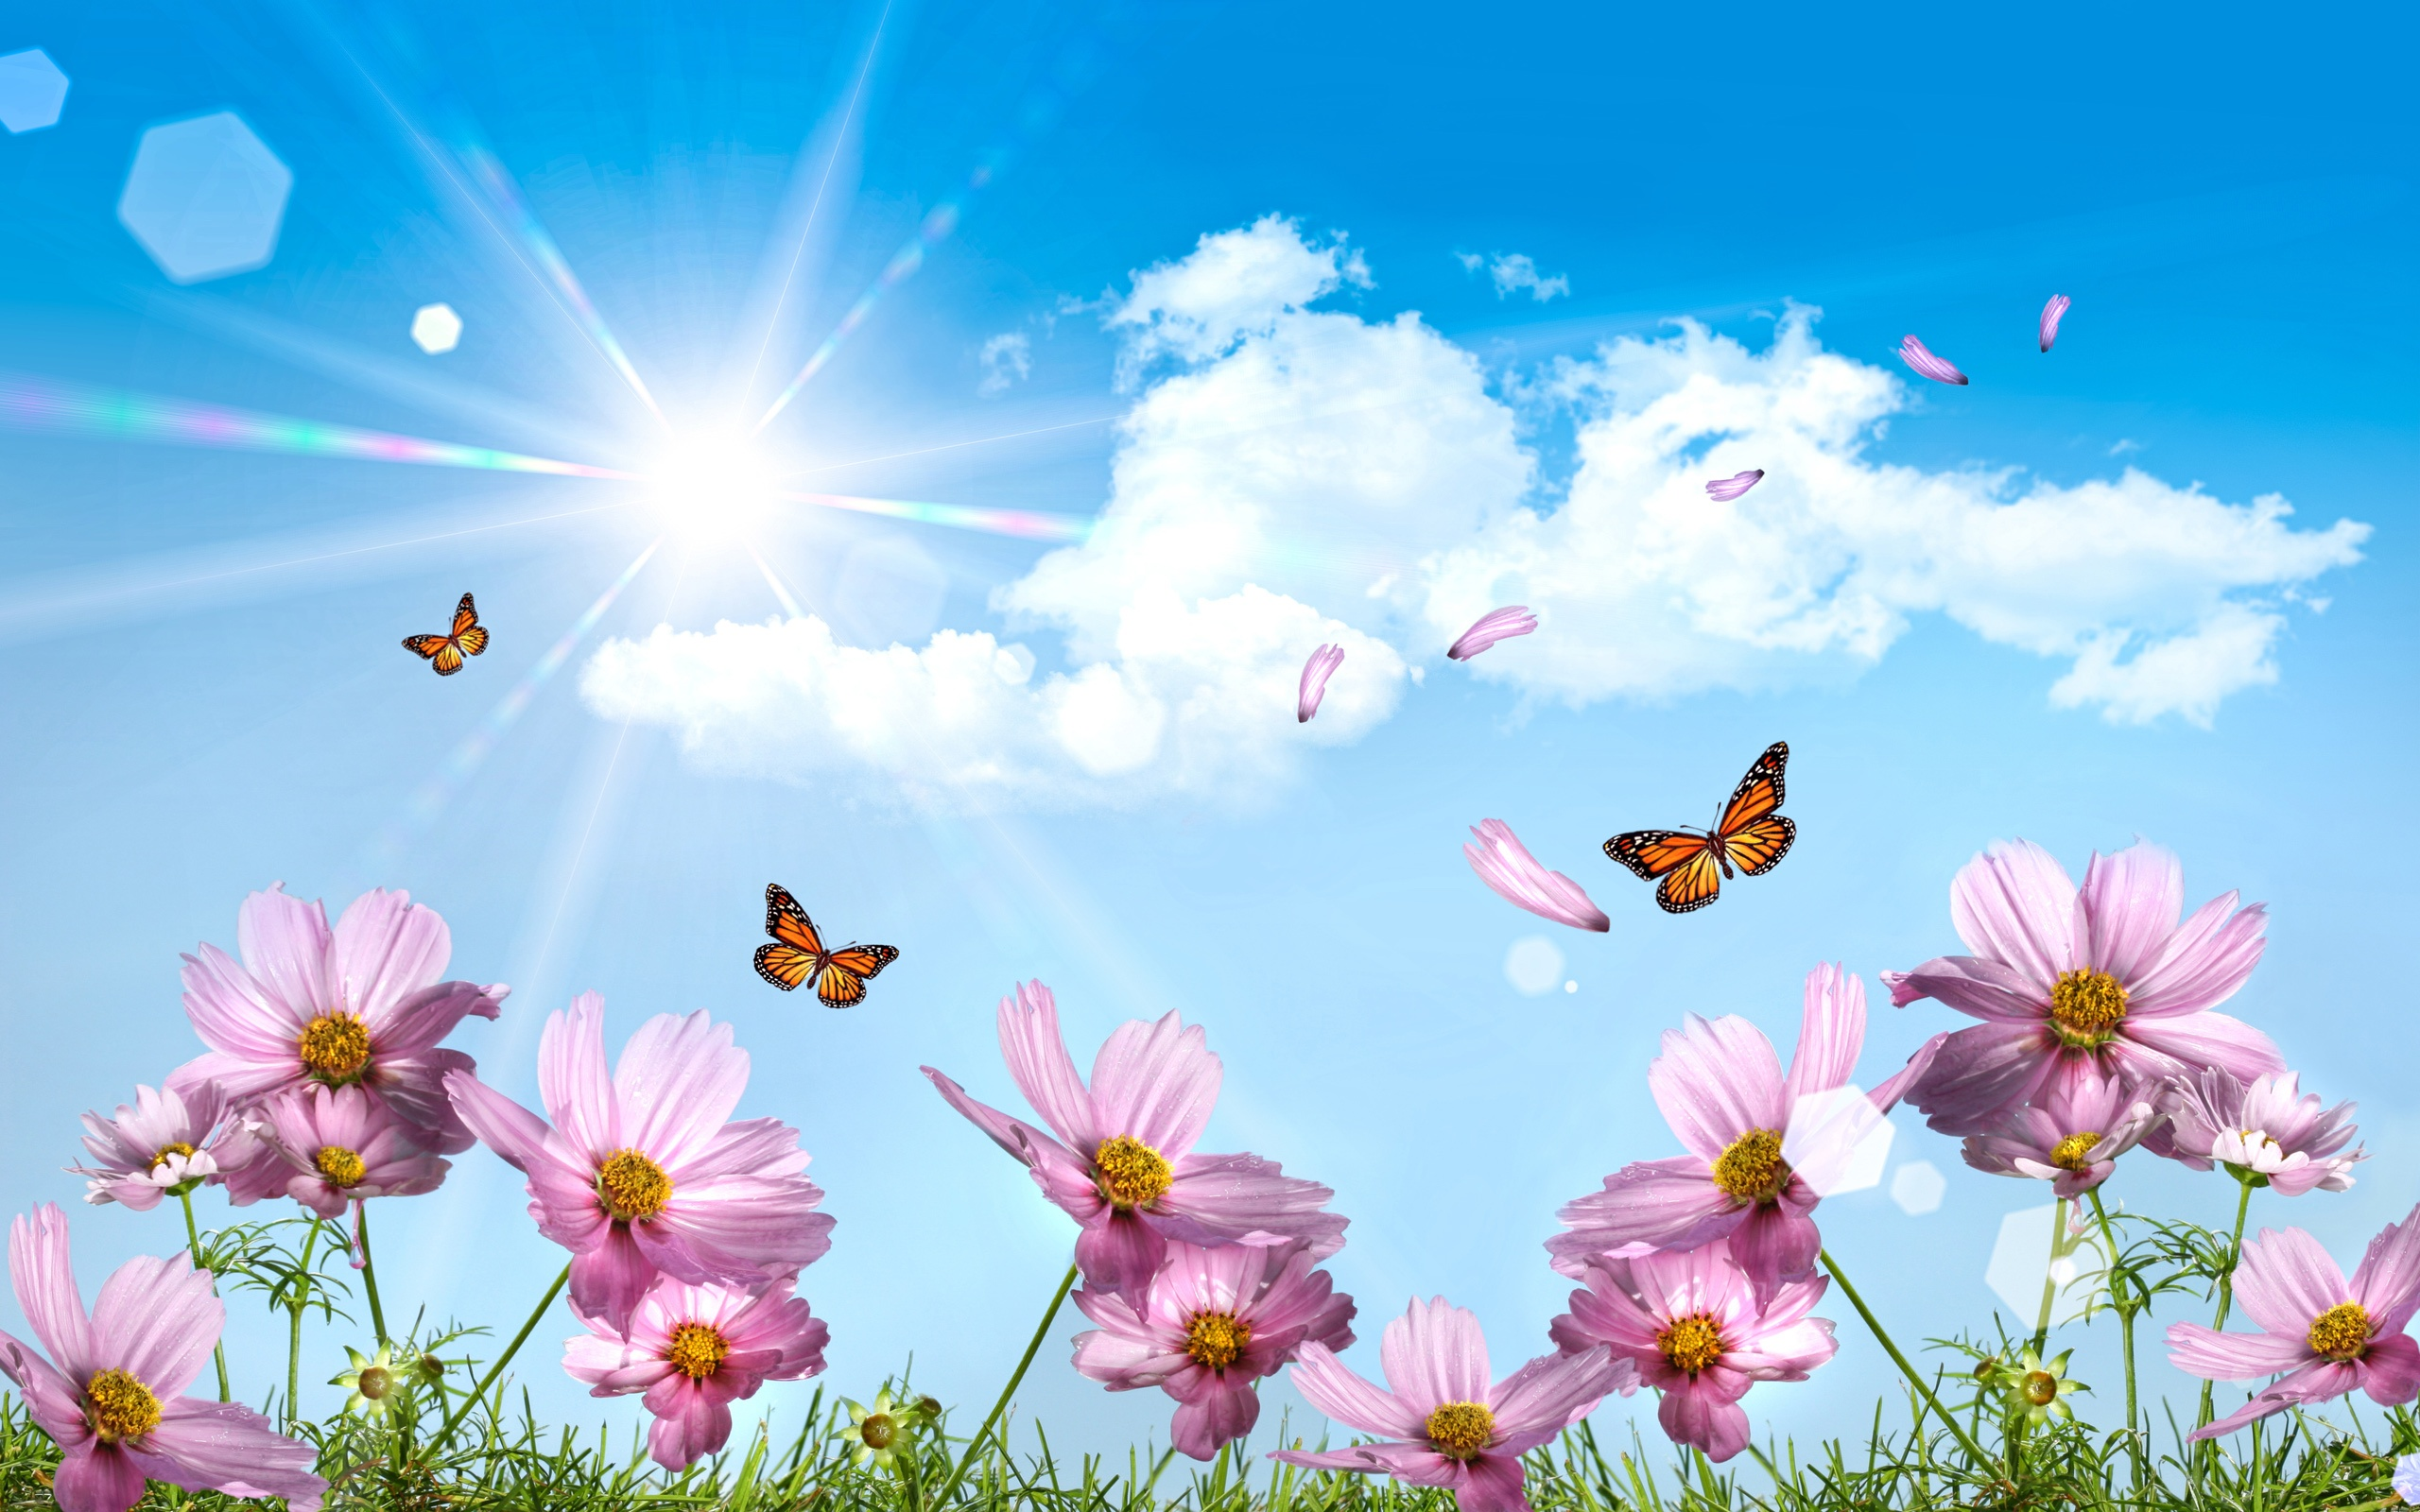 Description: The Wallpaper above is Meadow Butterflies Wallpaper in Resolution 2560x1600. Choose your Resolution and Download Meadow Butterflies Wallpaper